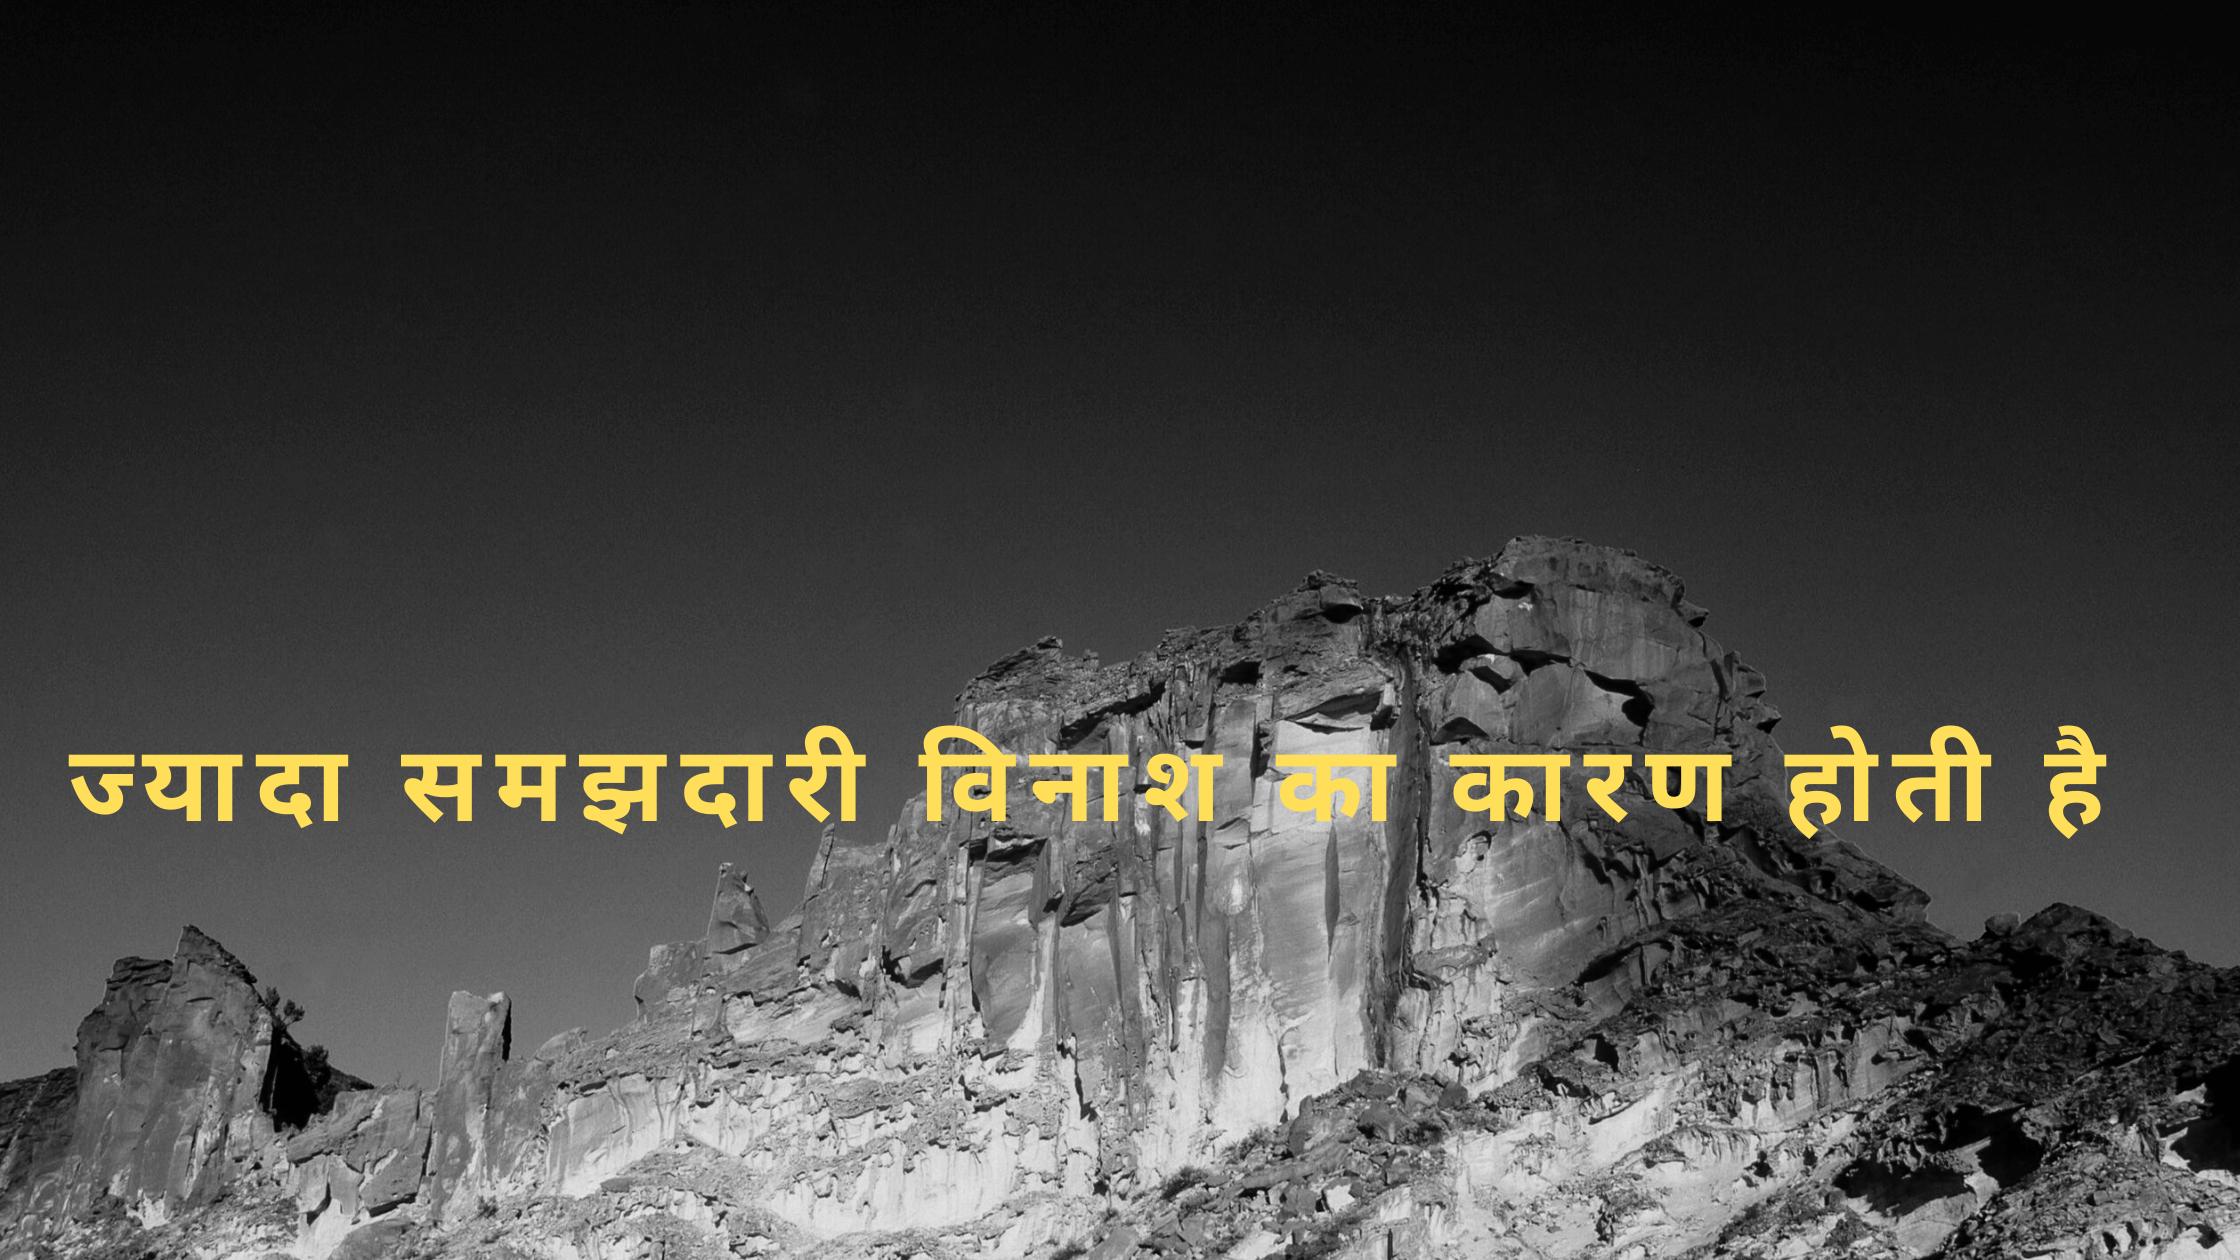 ज्यादा समझदारी विनाश का कारण होती है – Jyada Samjhdari Vinash Ka Karn Hoti Hai